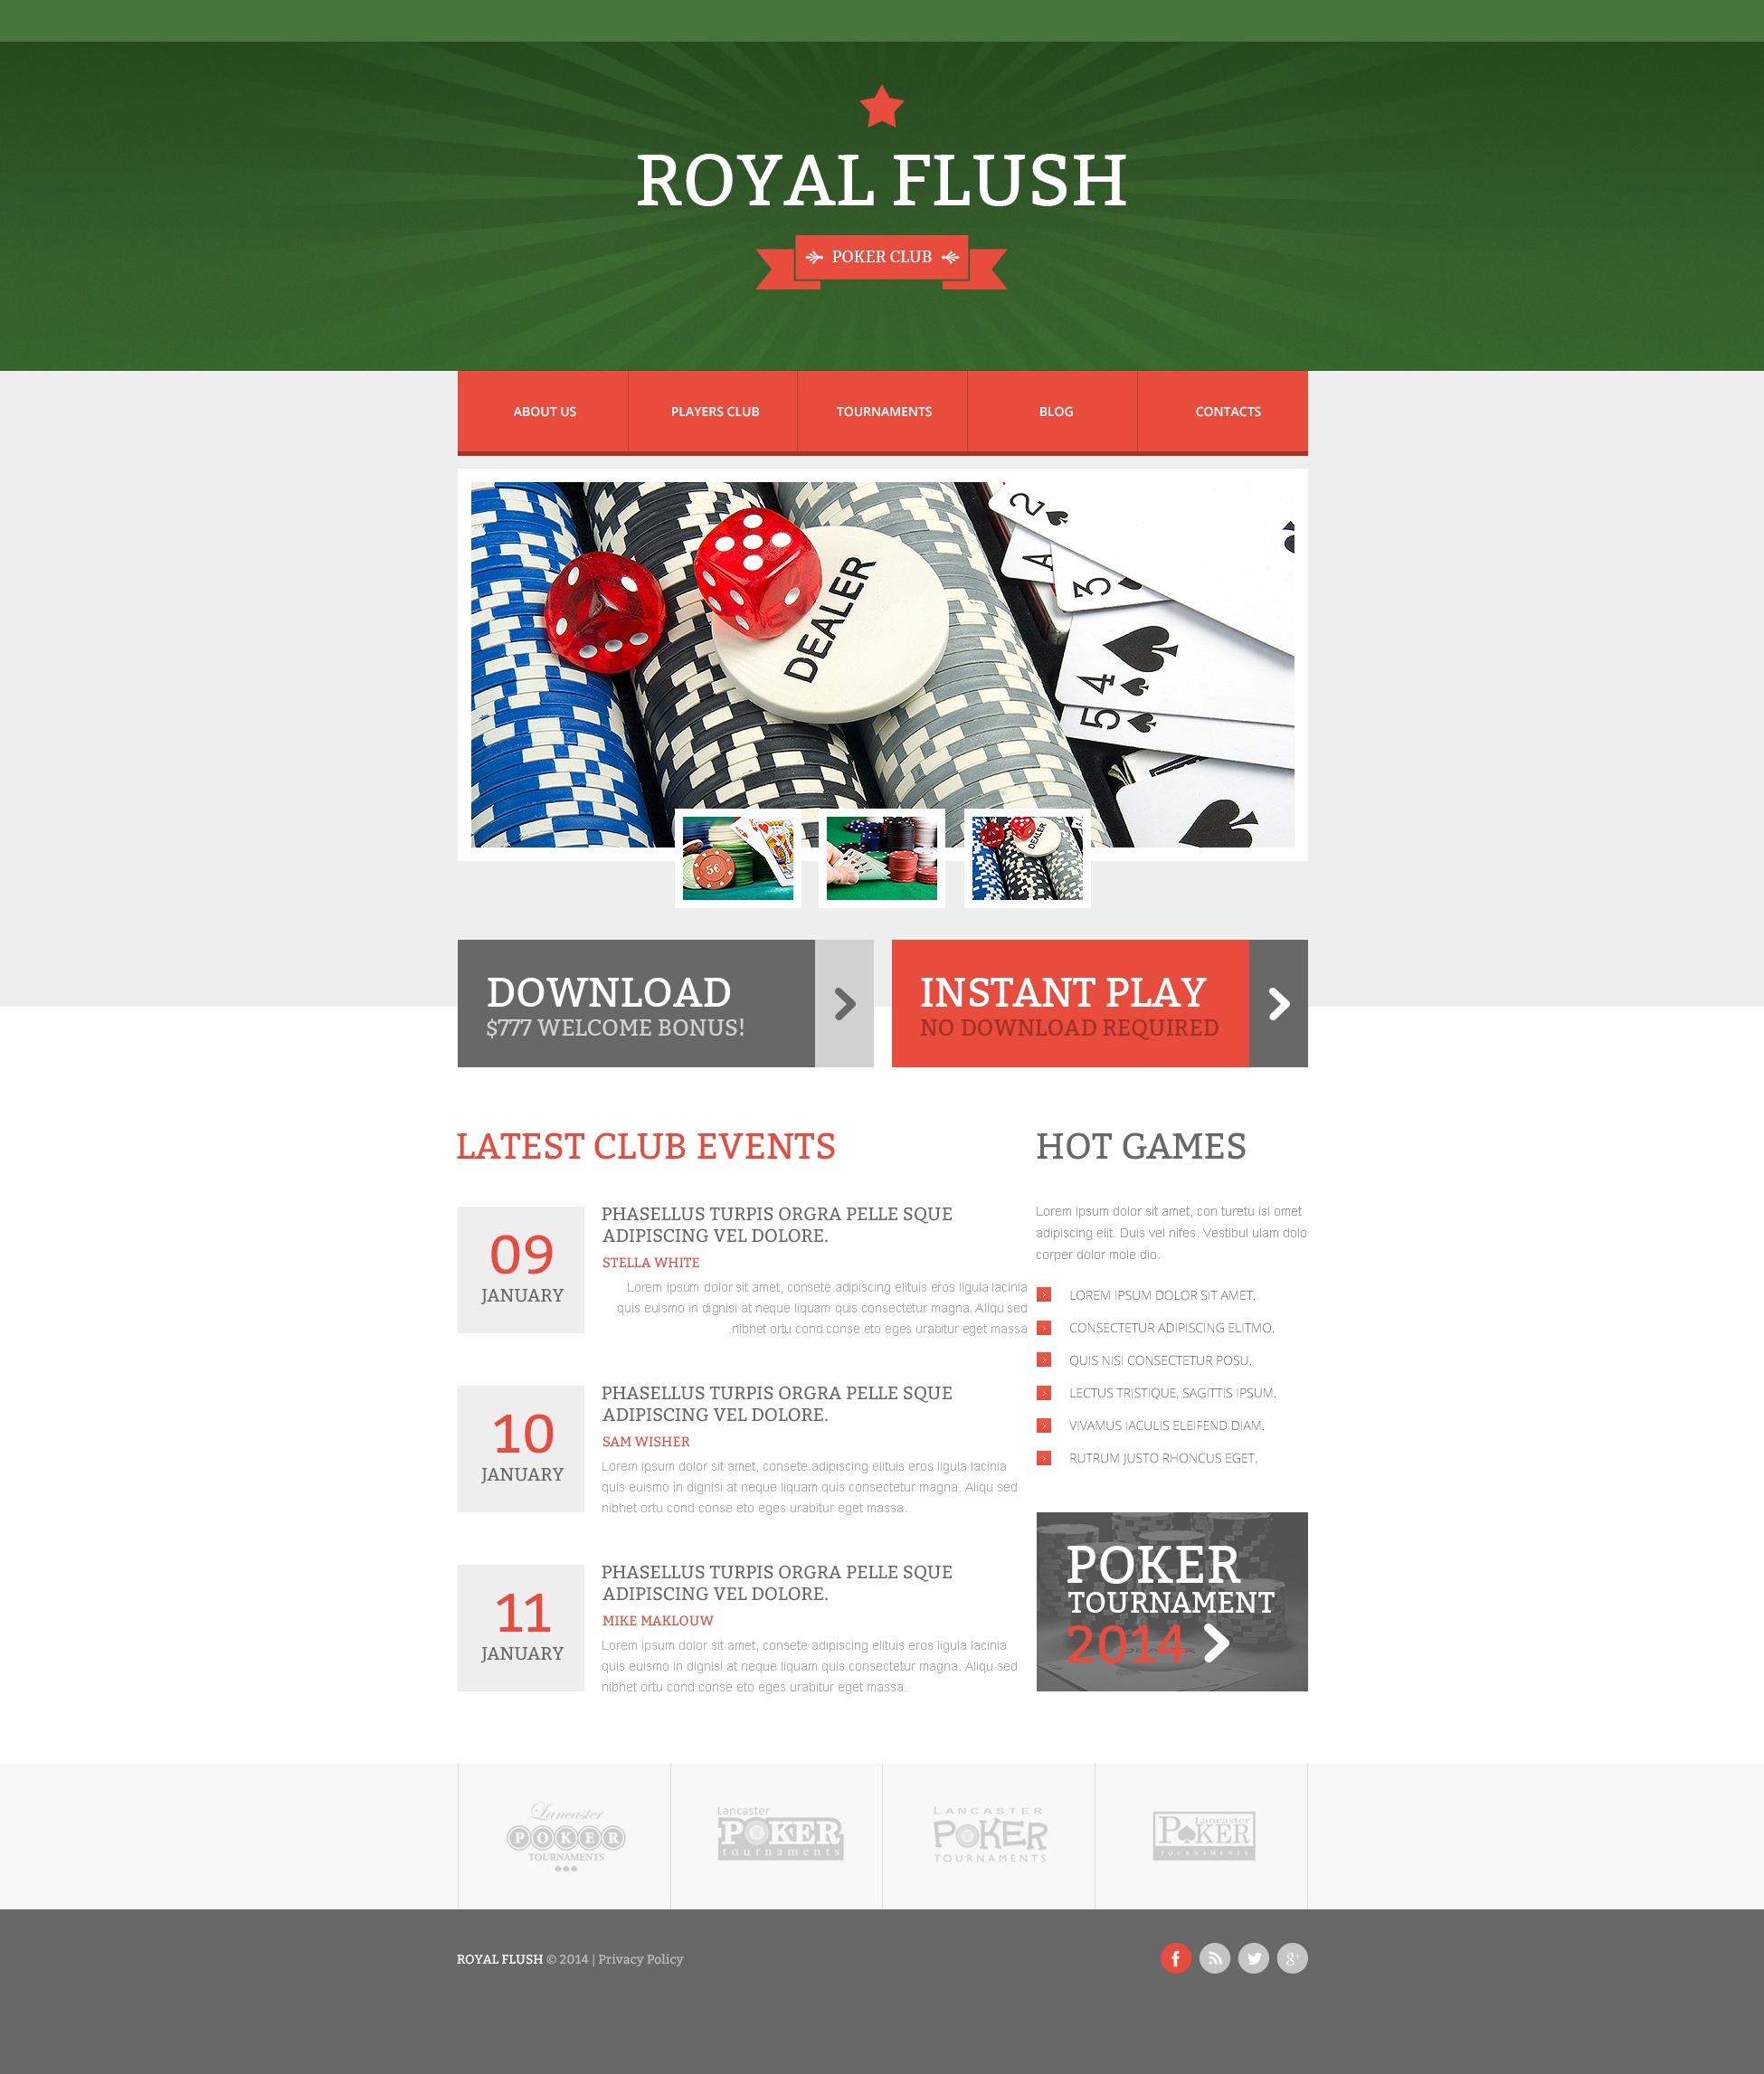 Plantilla Web Responsive para Sitio de Poker online #48666 - captura de pantalla